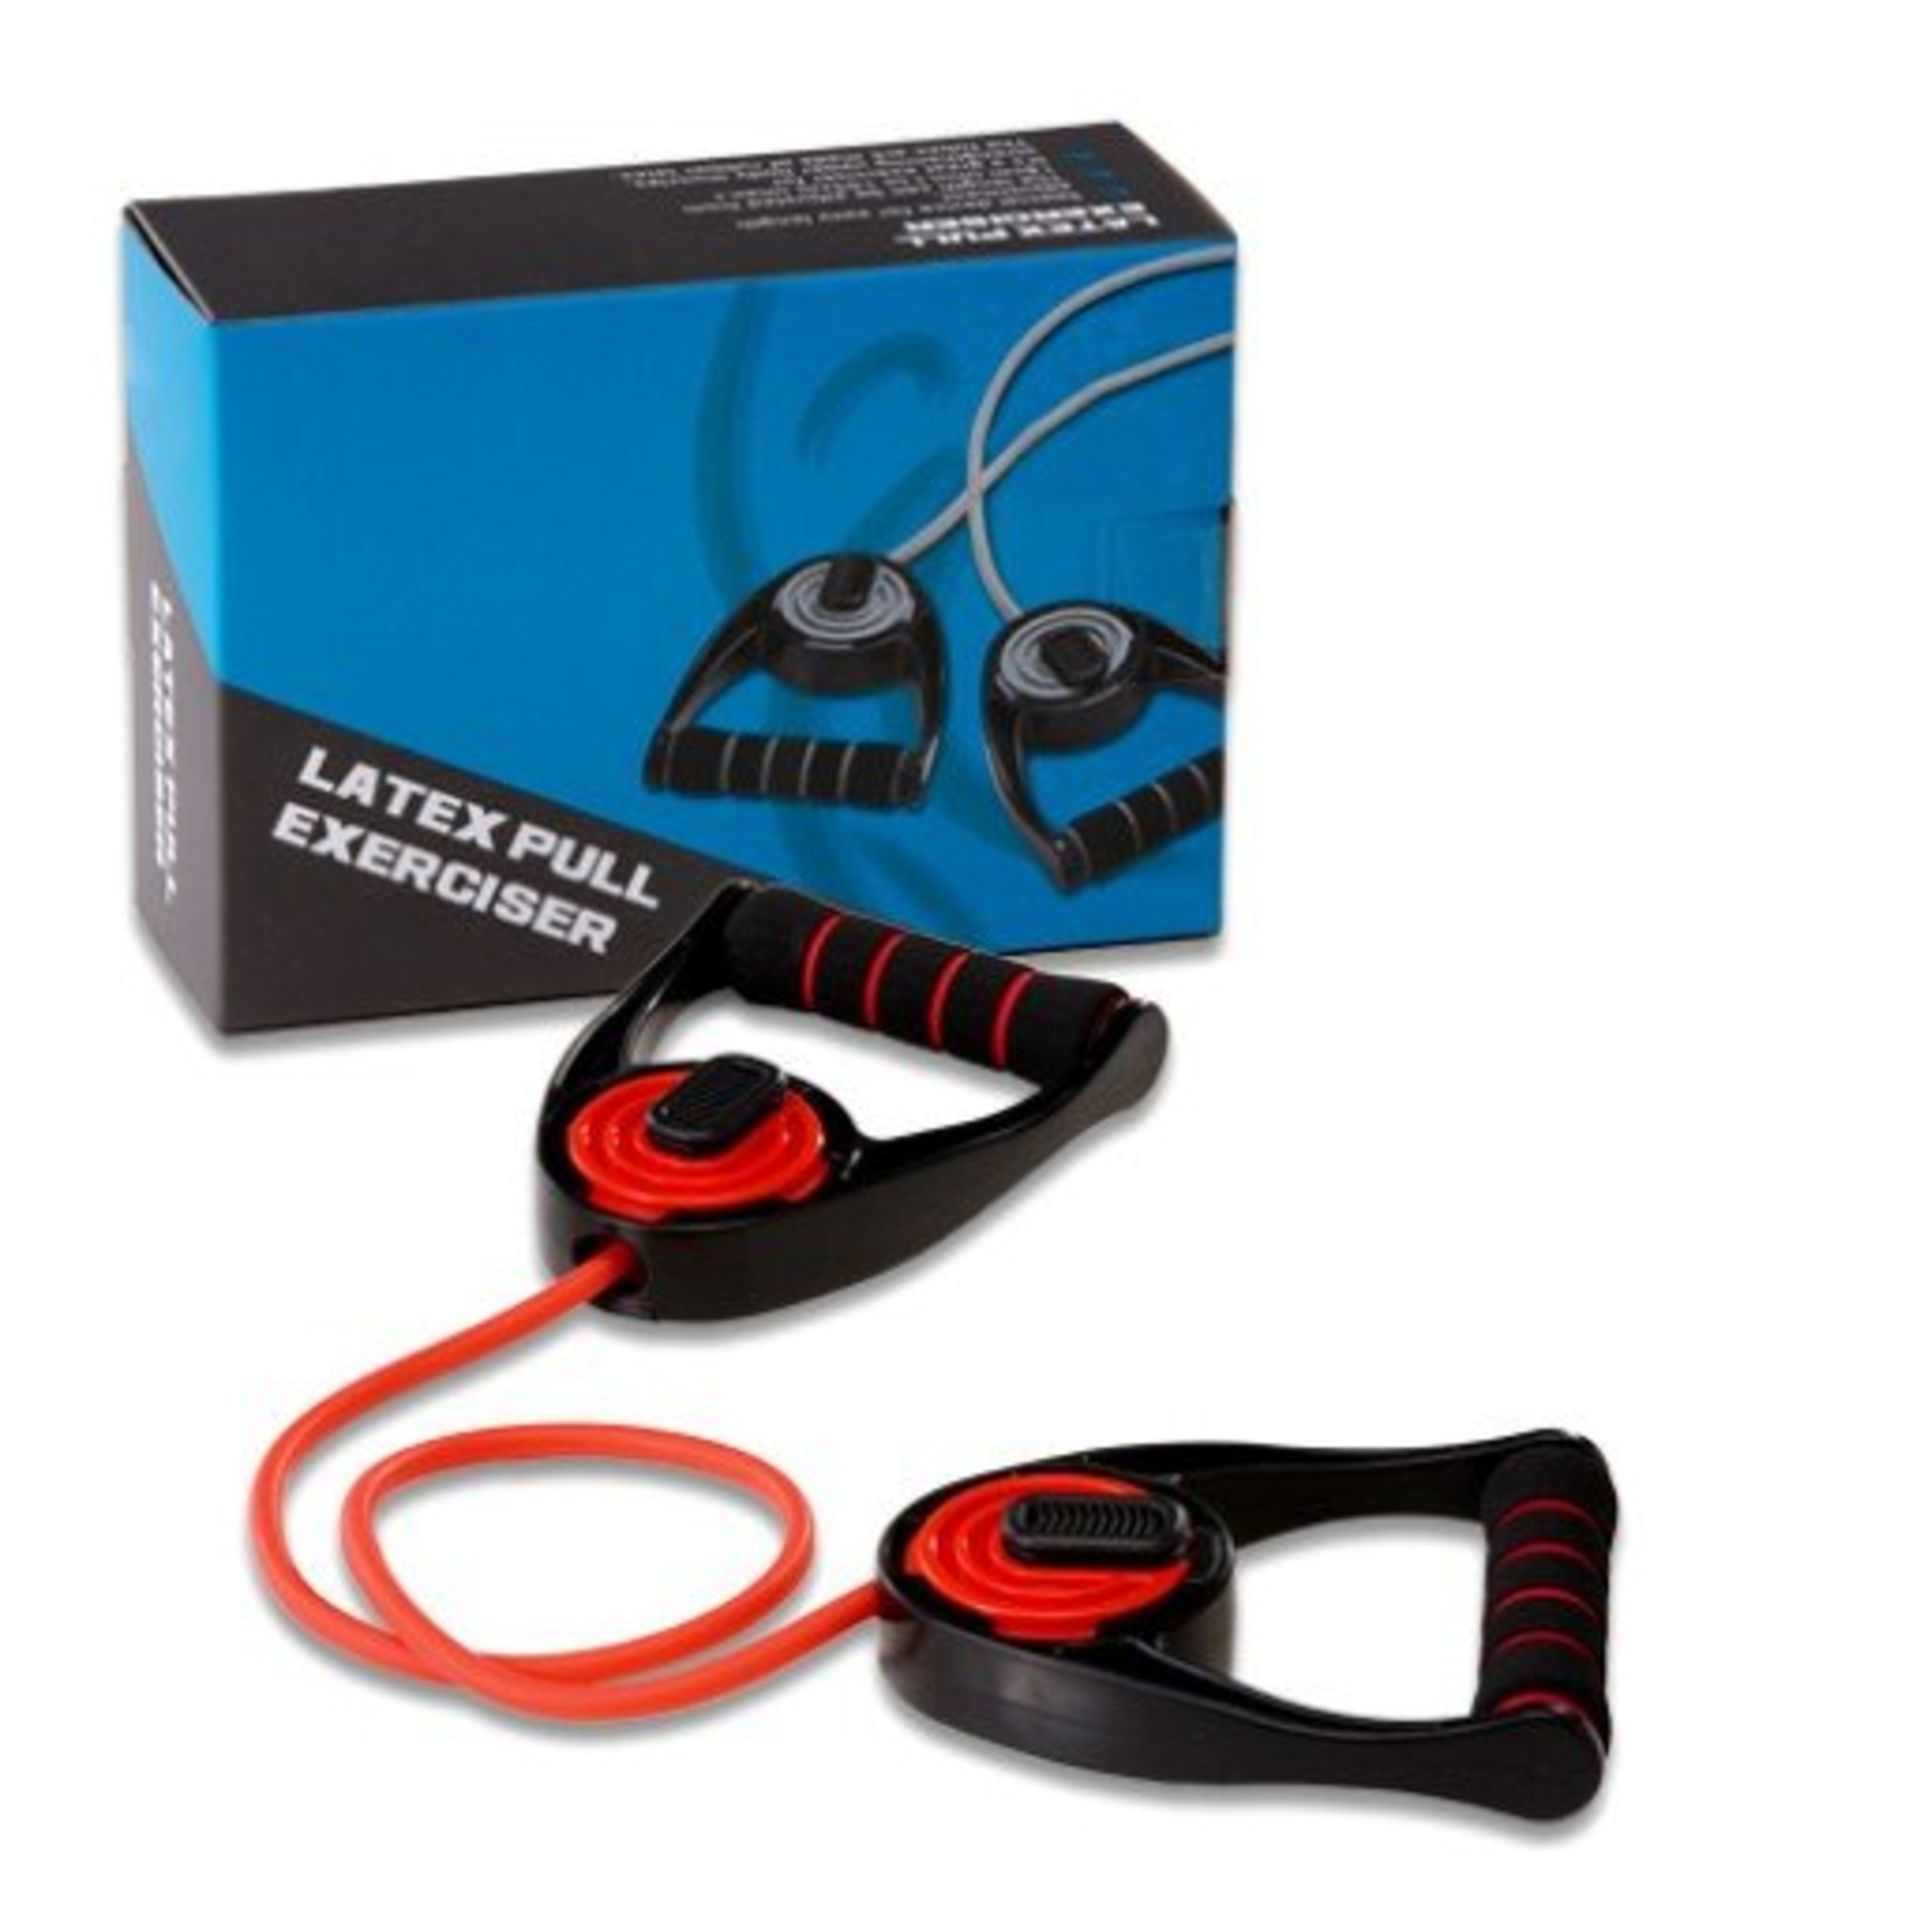 Brand New Clubfit - Latex Pull Exerciser